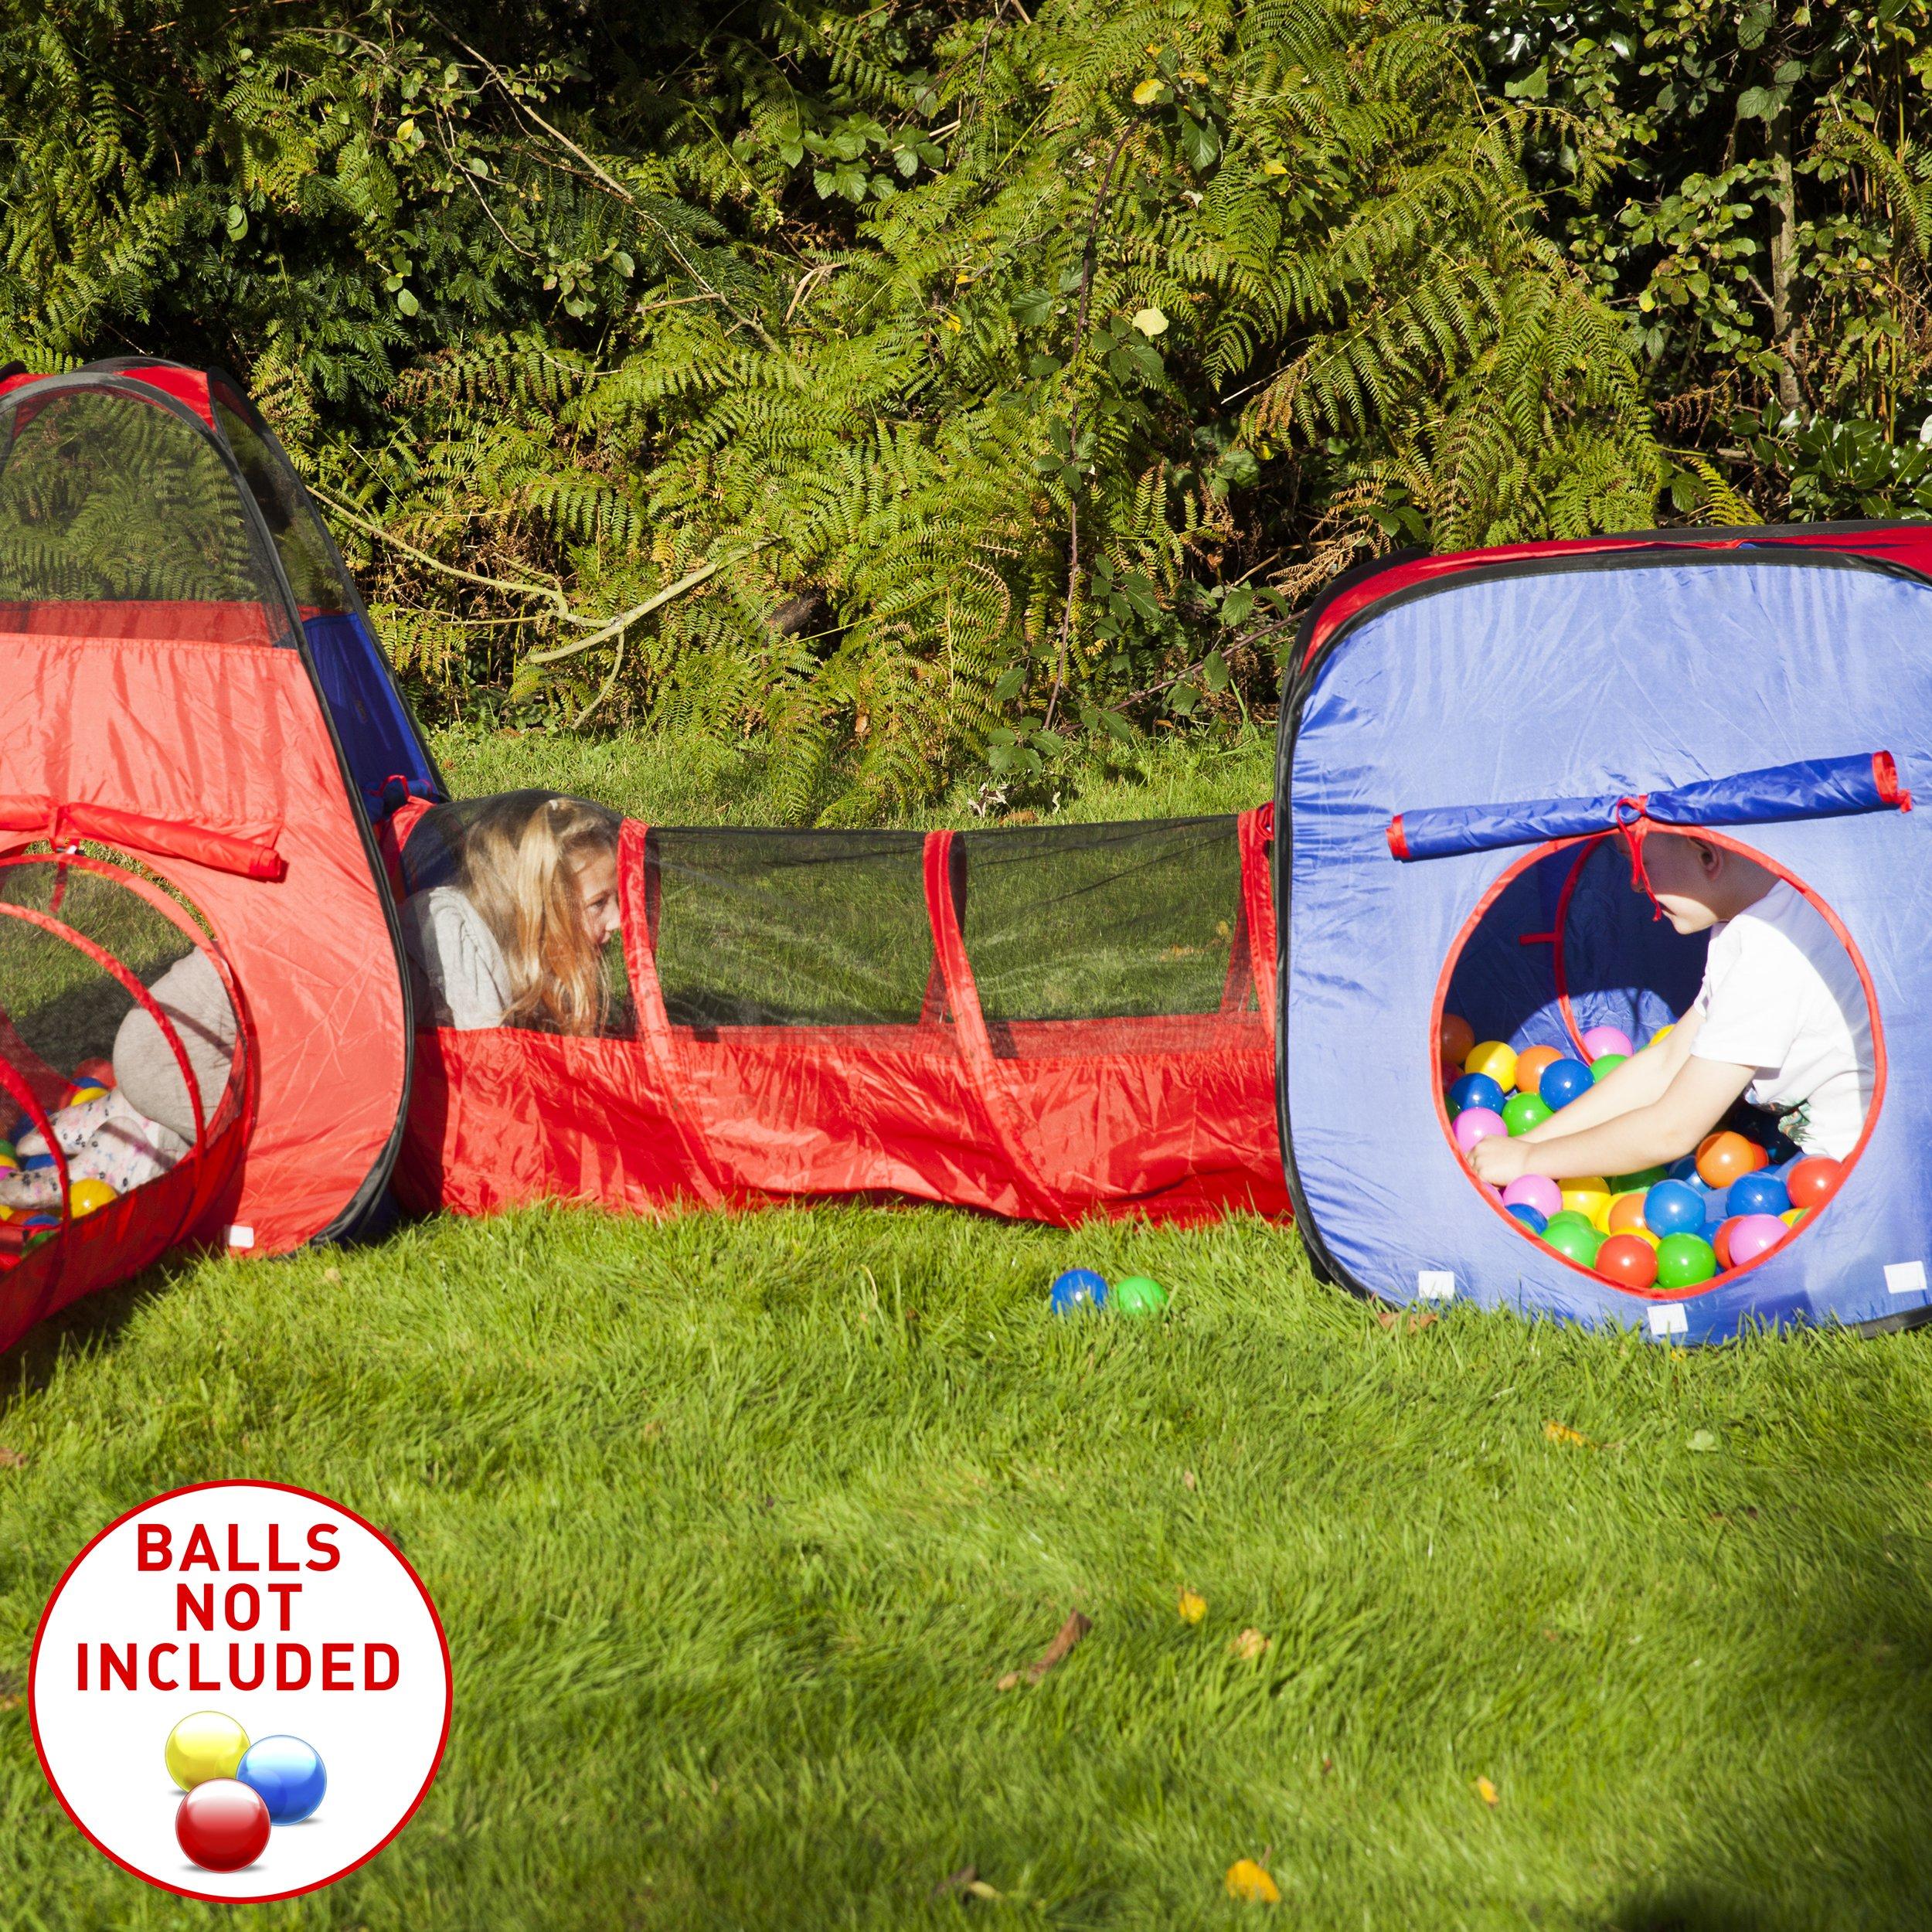 Kiddzery 4pc Kids Play Tent Pop Up Ball Pit 2 Tents 2